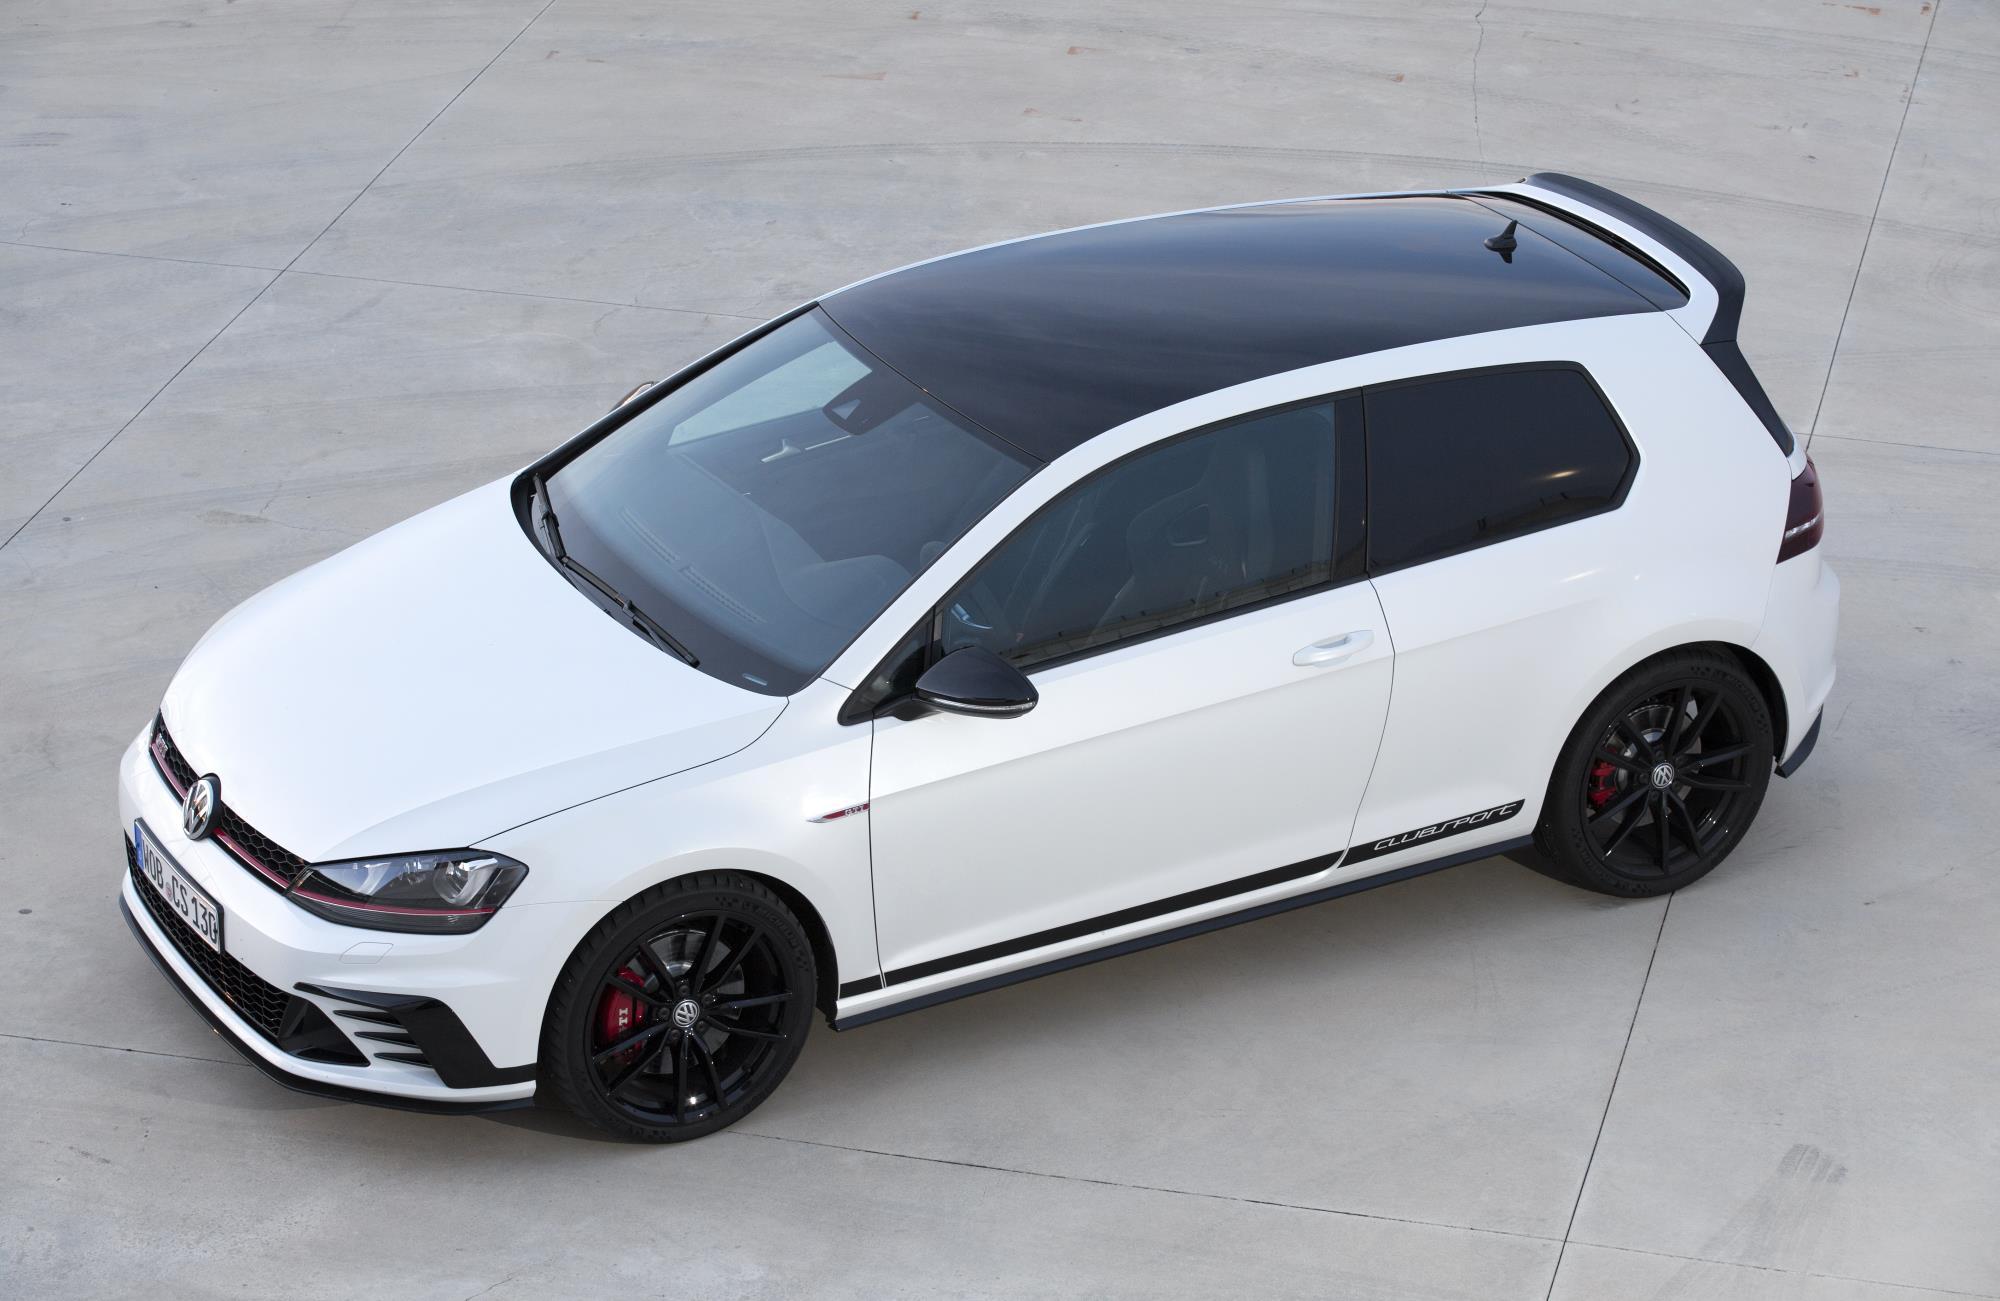 Volk Wagon Volkswagen Gti 2018 Modified